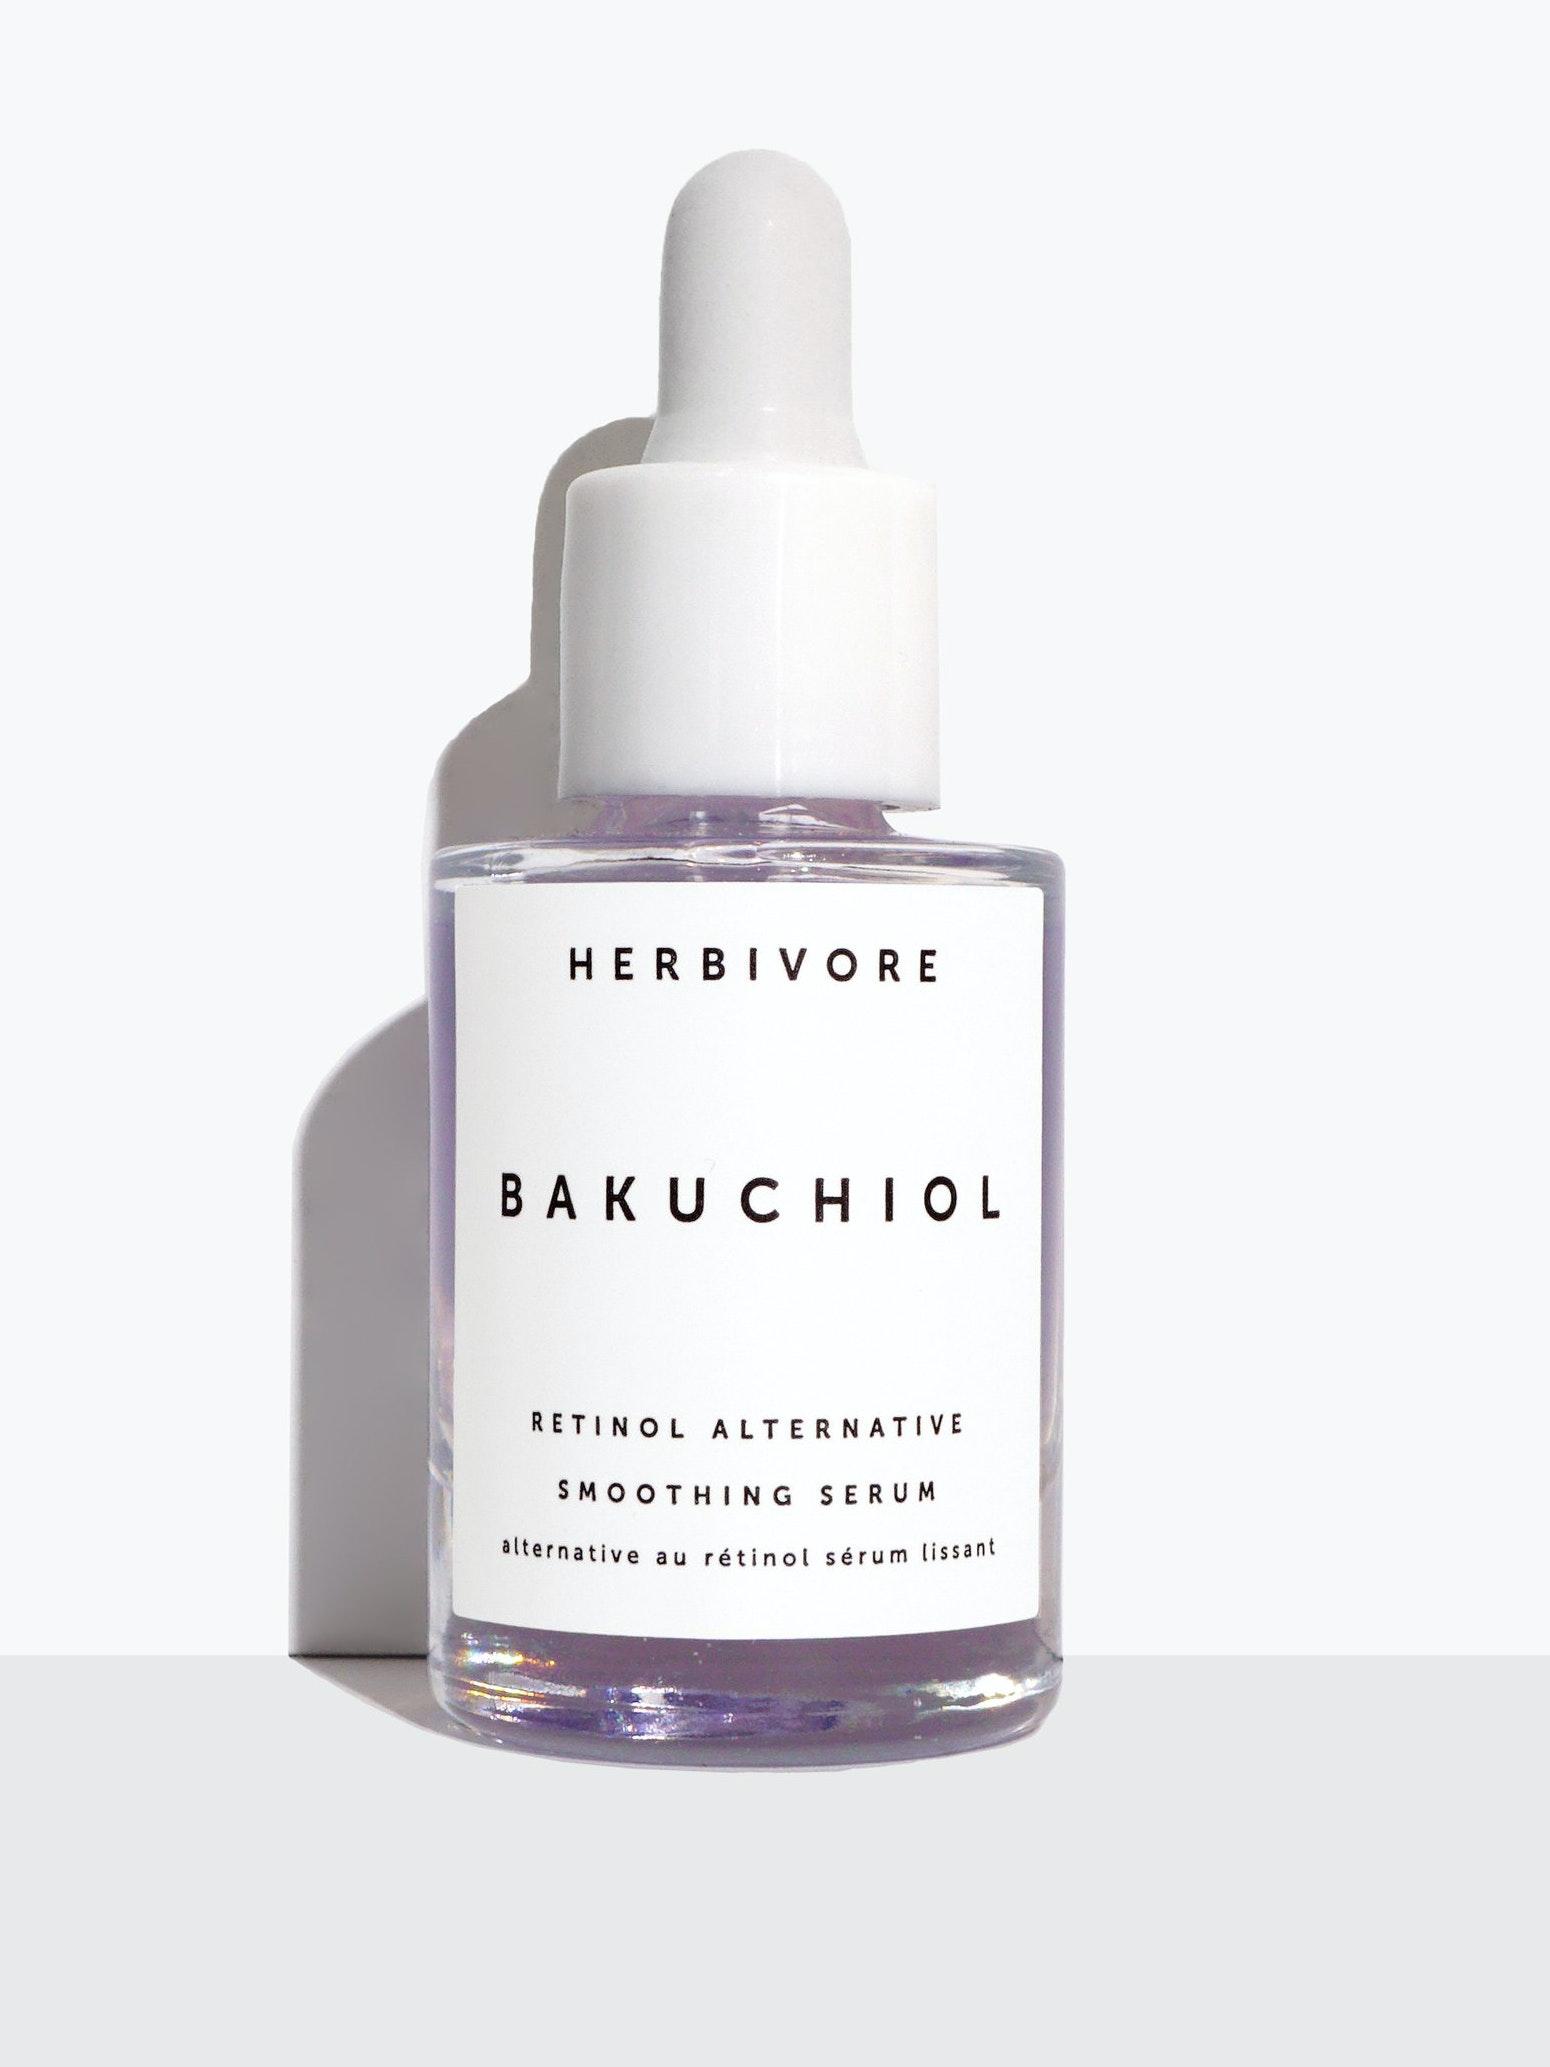 Bakuchiol serum